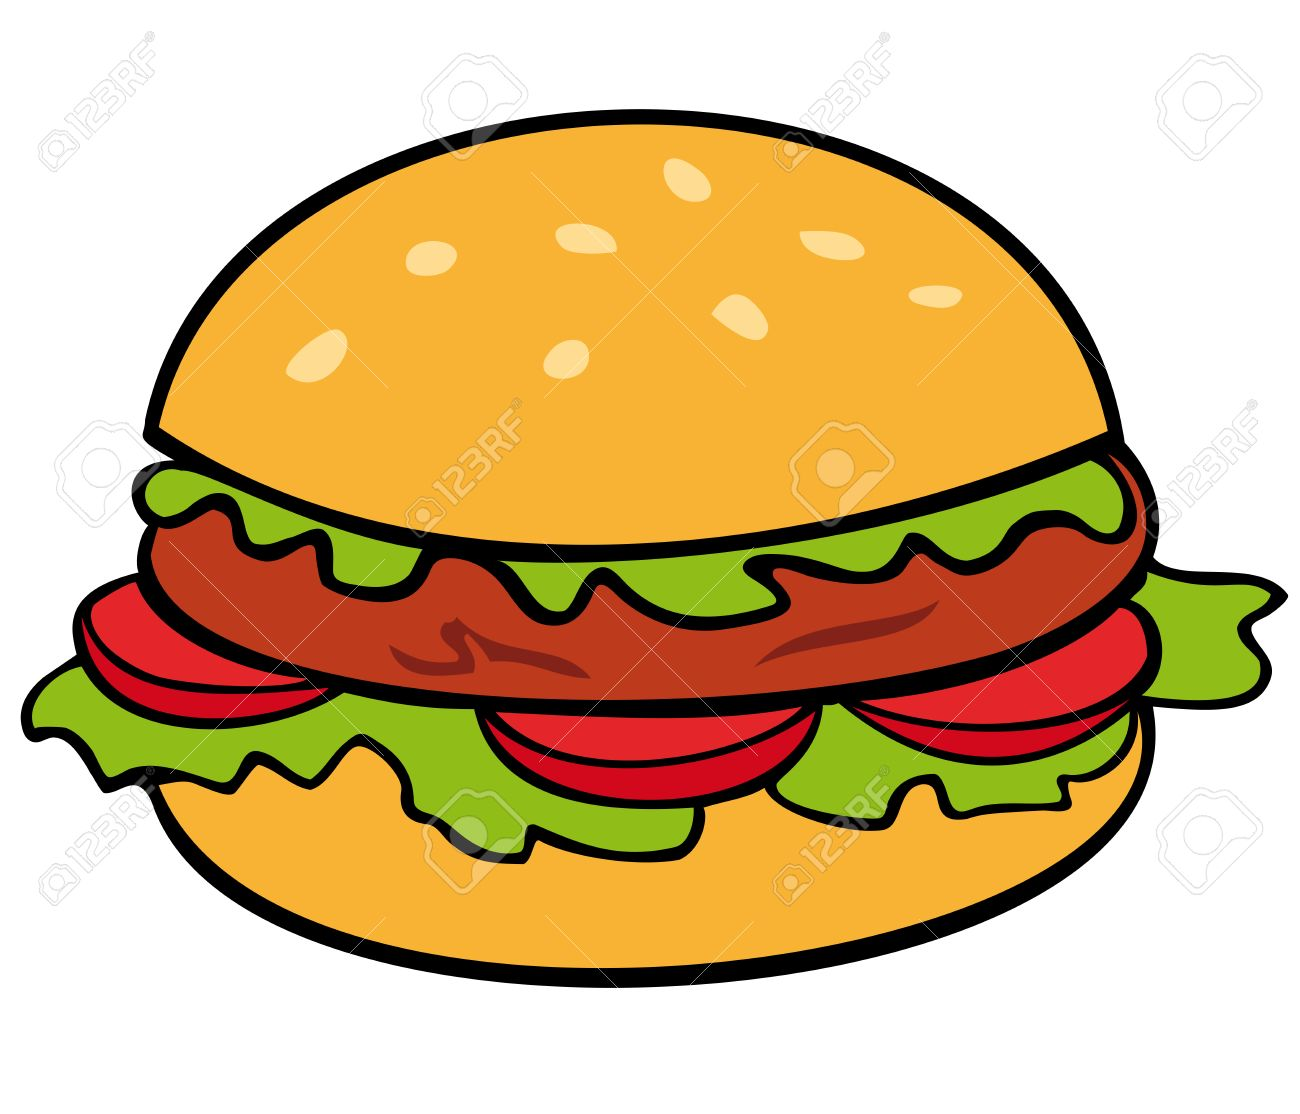 hamburger royalty free cliparts vectors and stock illustration rh 123rf com cartoon burger vector cartoon burger